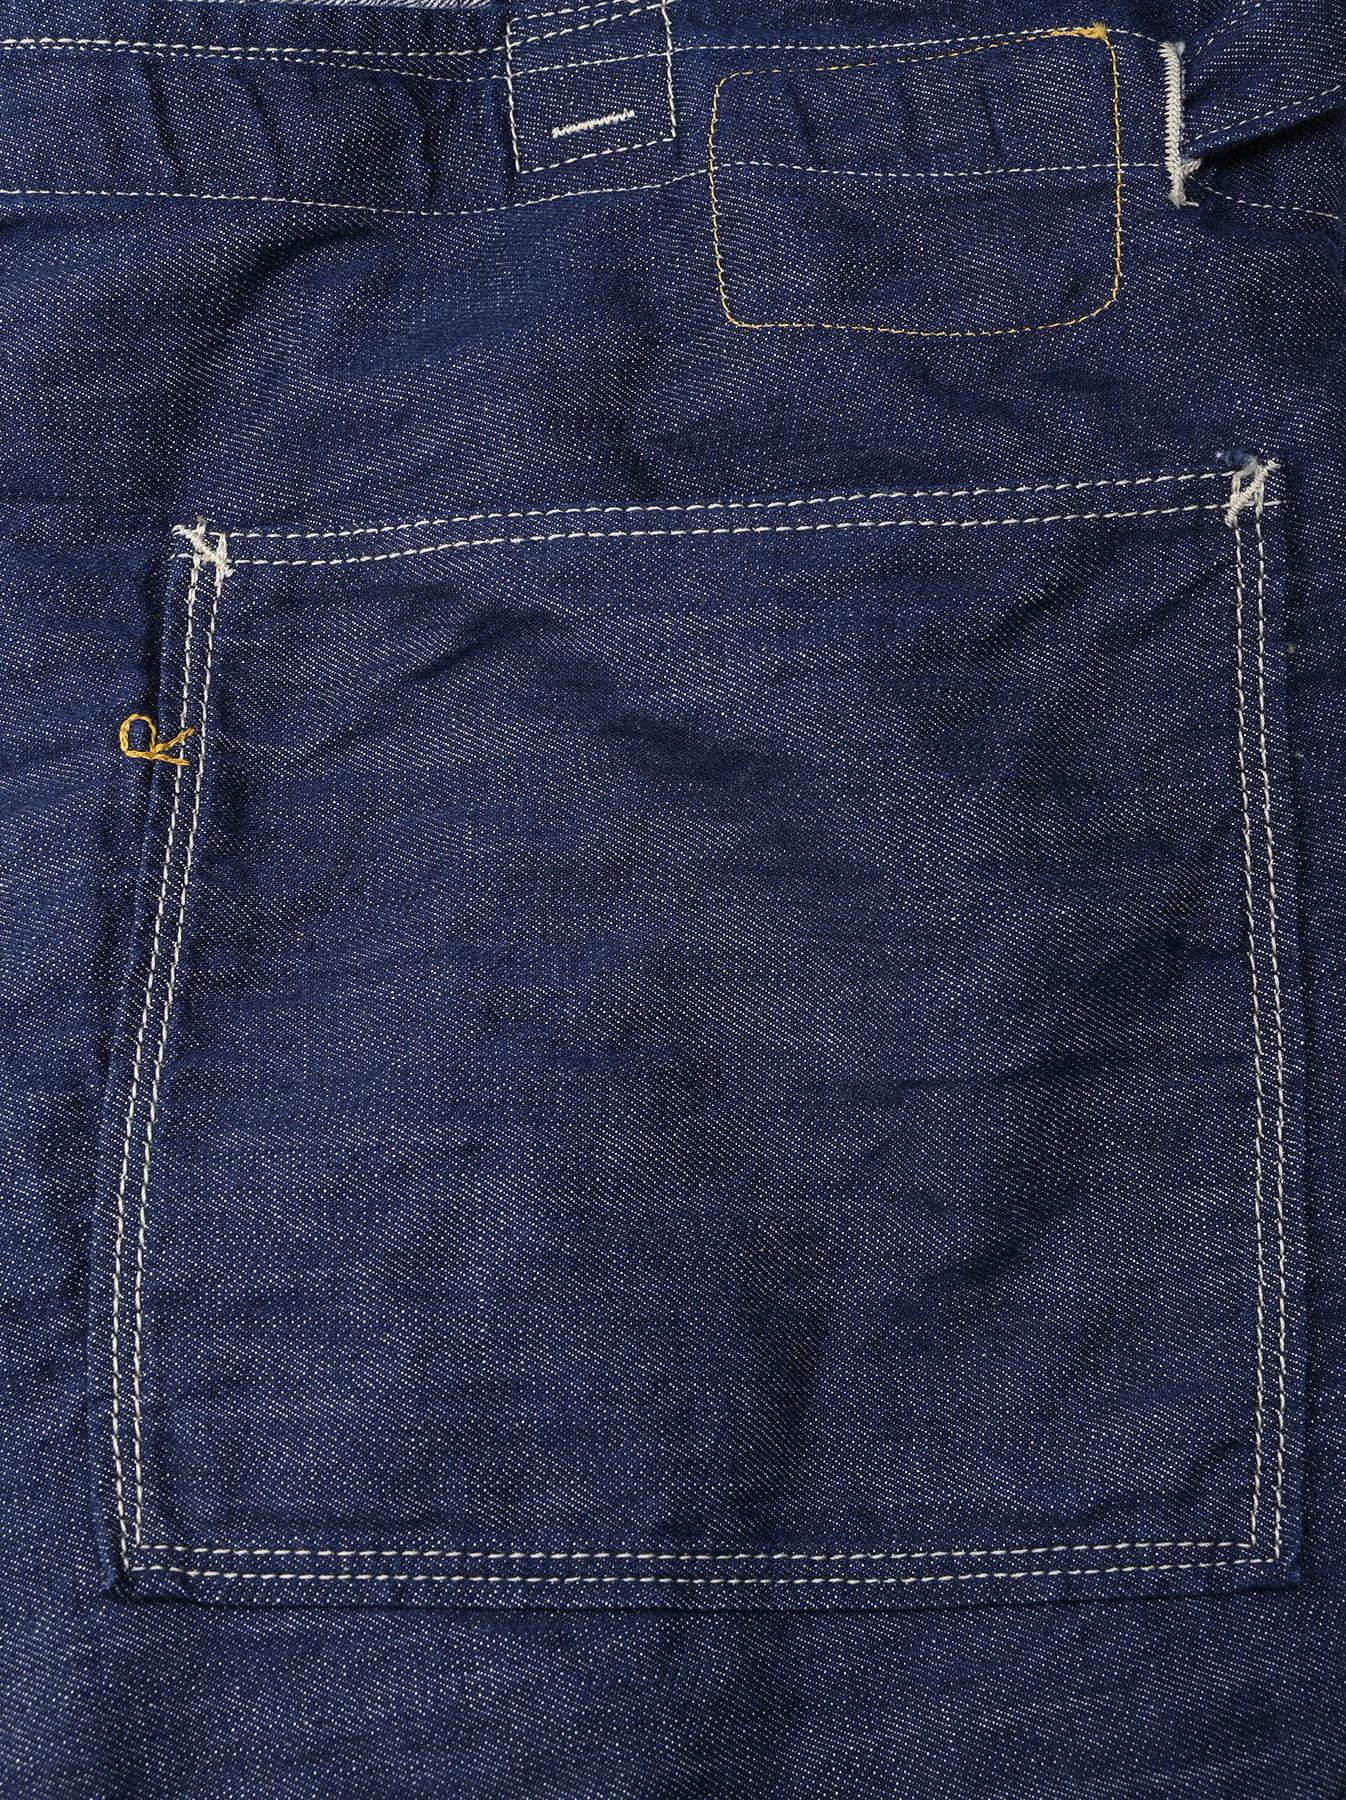 Monpu Apron Dress (0421)-7